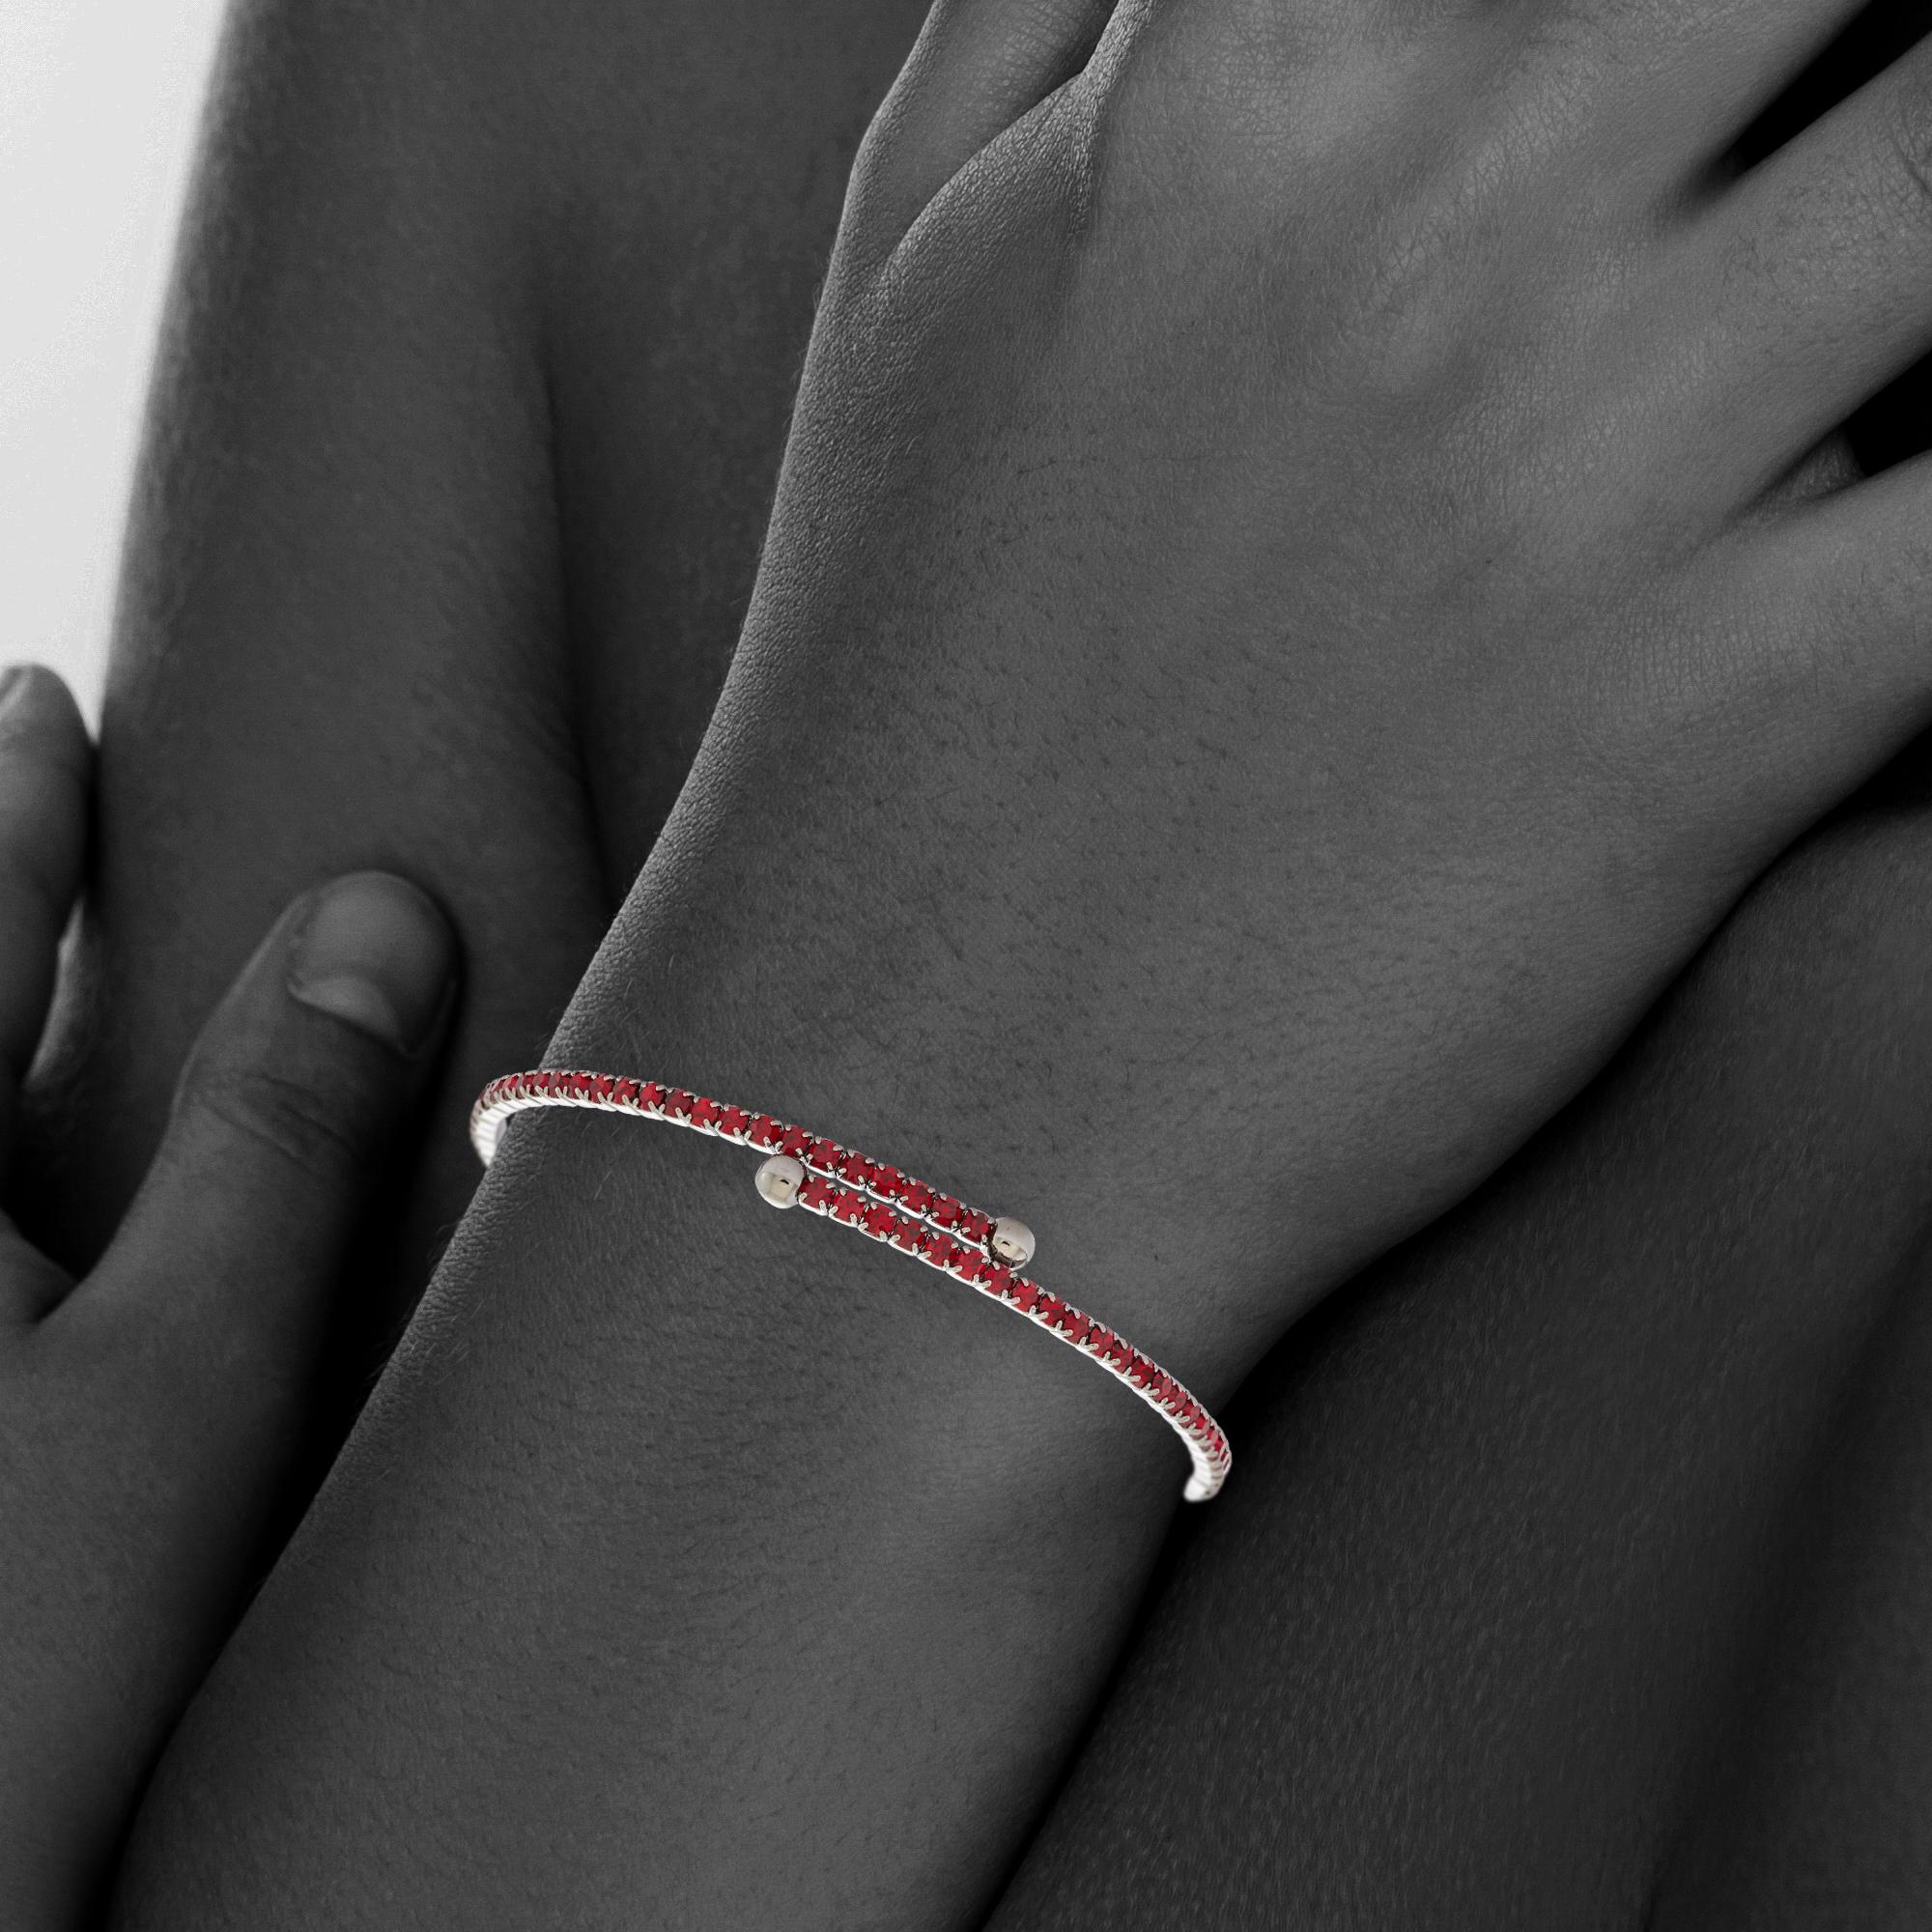 Womens-Ladies-Fashion-Accessories-Jewelry-Black-Rhodium-Plated-Bangle-Bracelet thumbnail 46